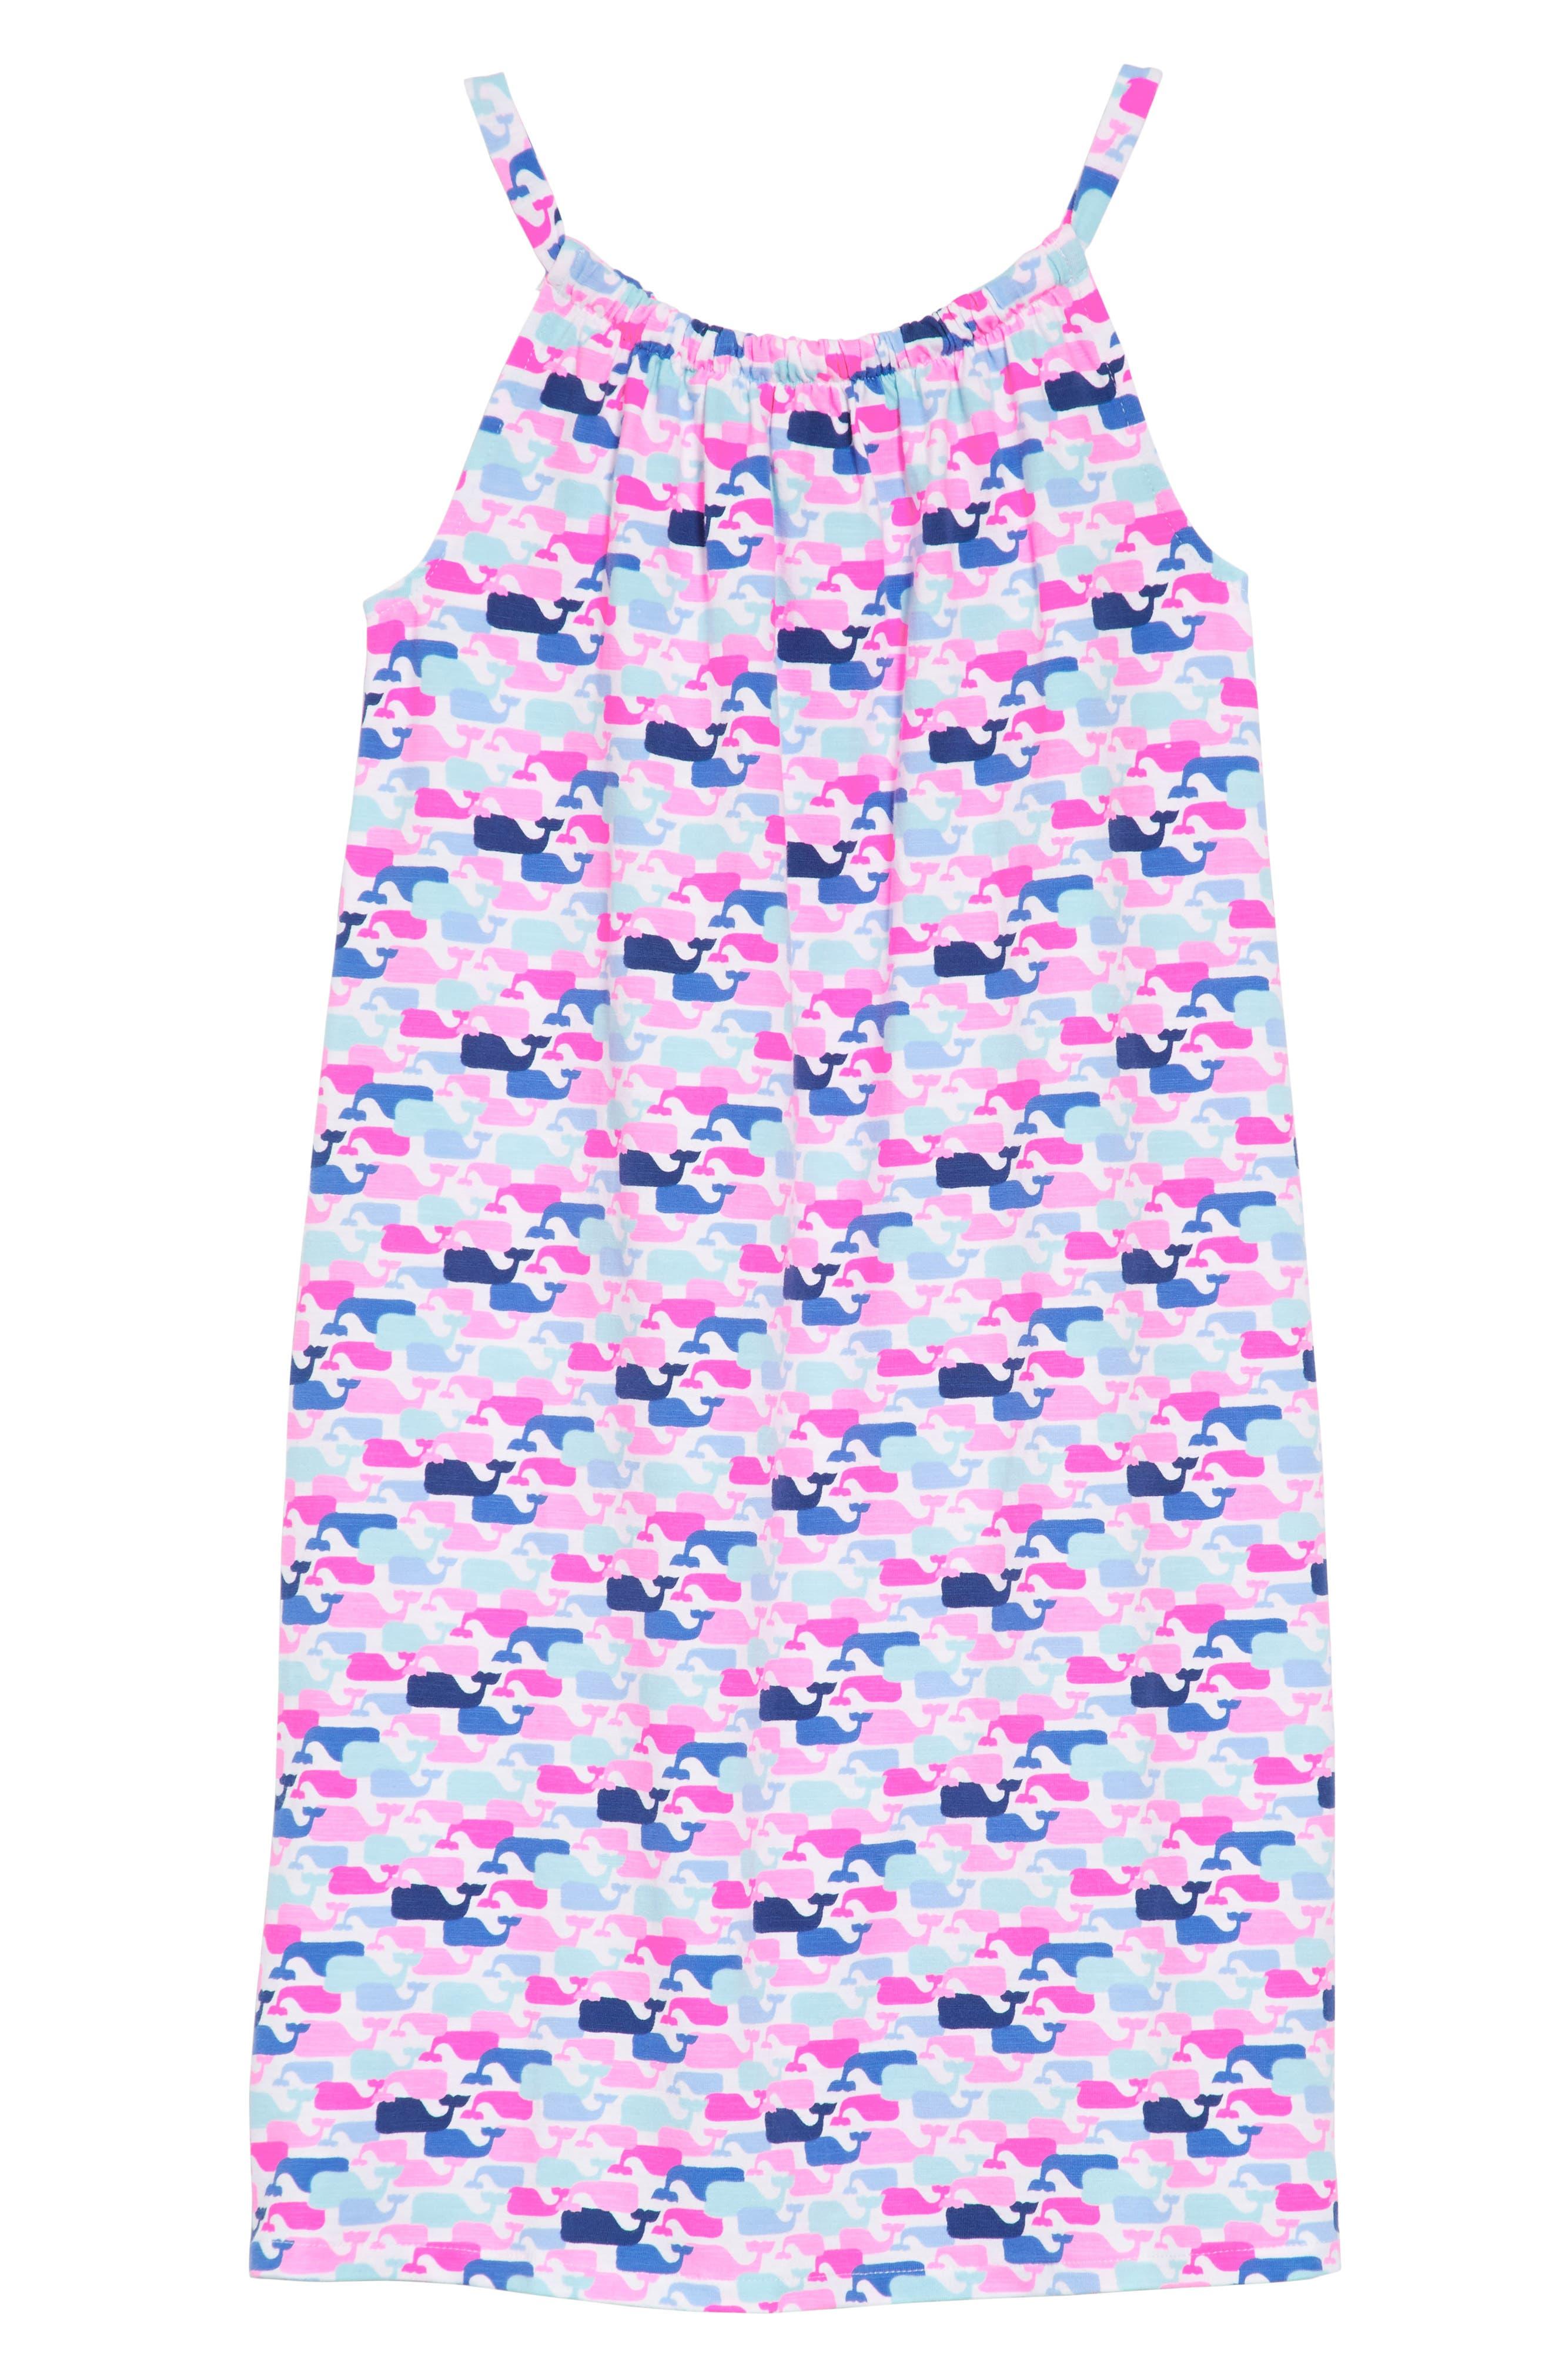 Whale Print Dress,                             Alternate thumbnail 2, color,                             100